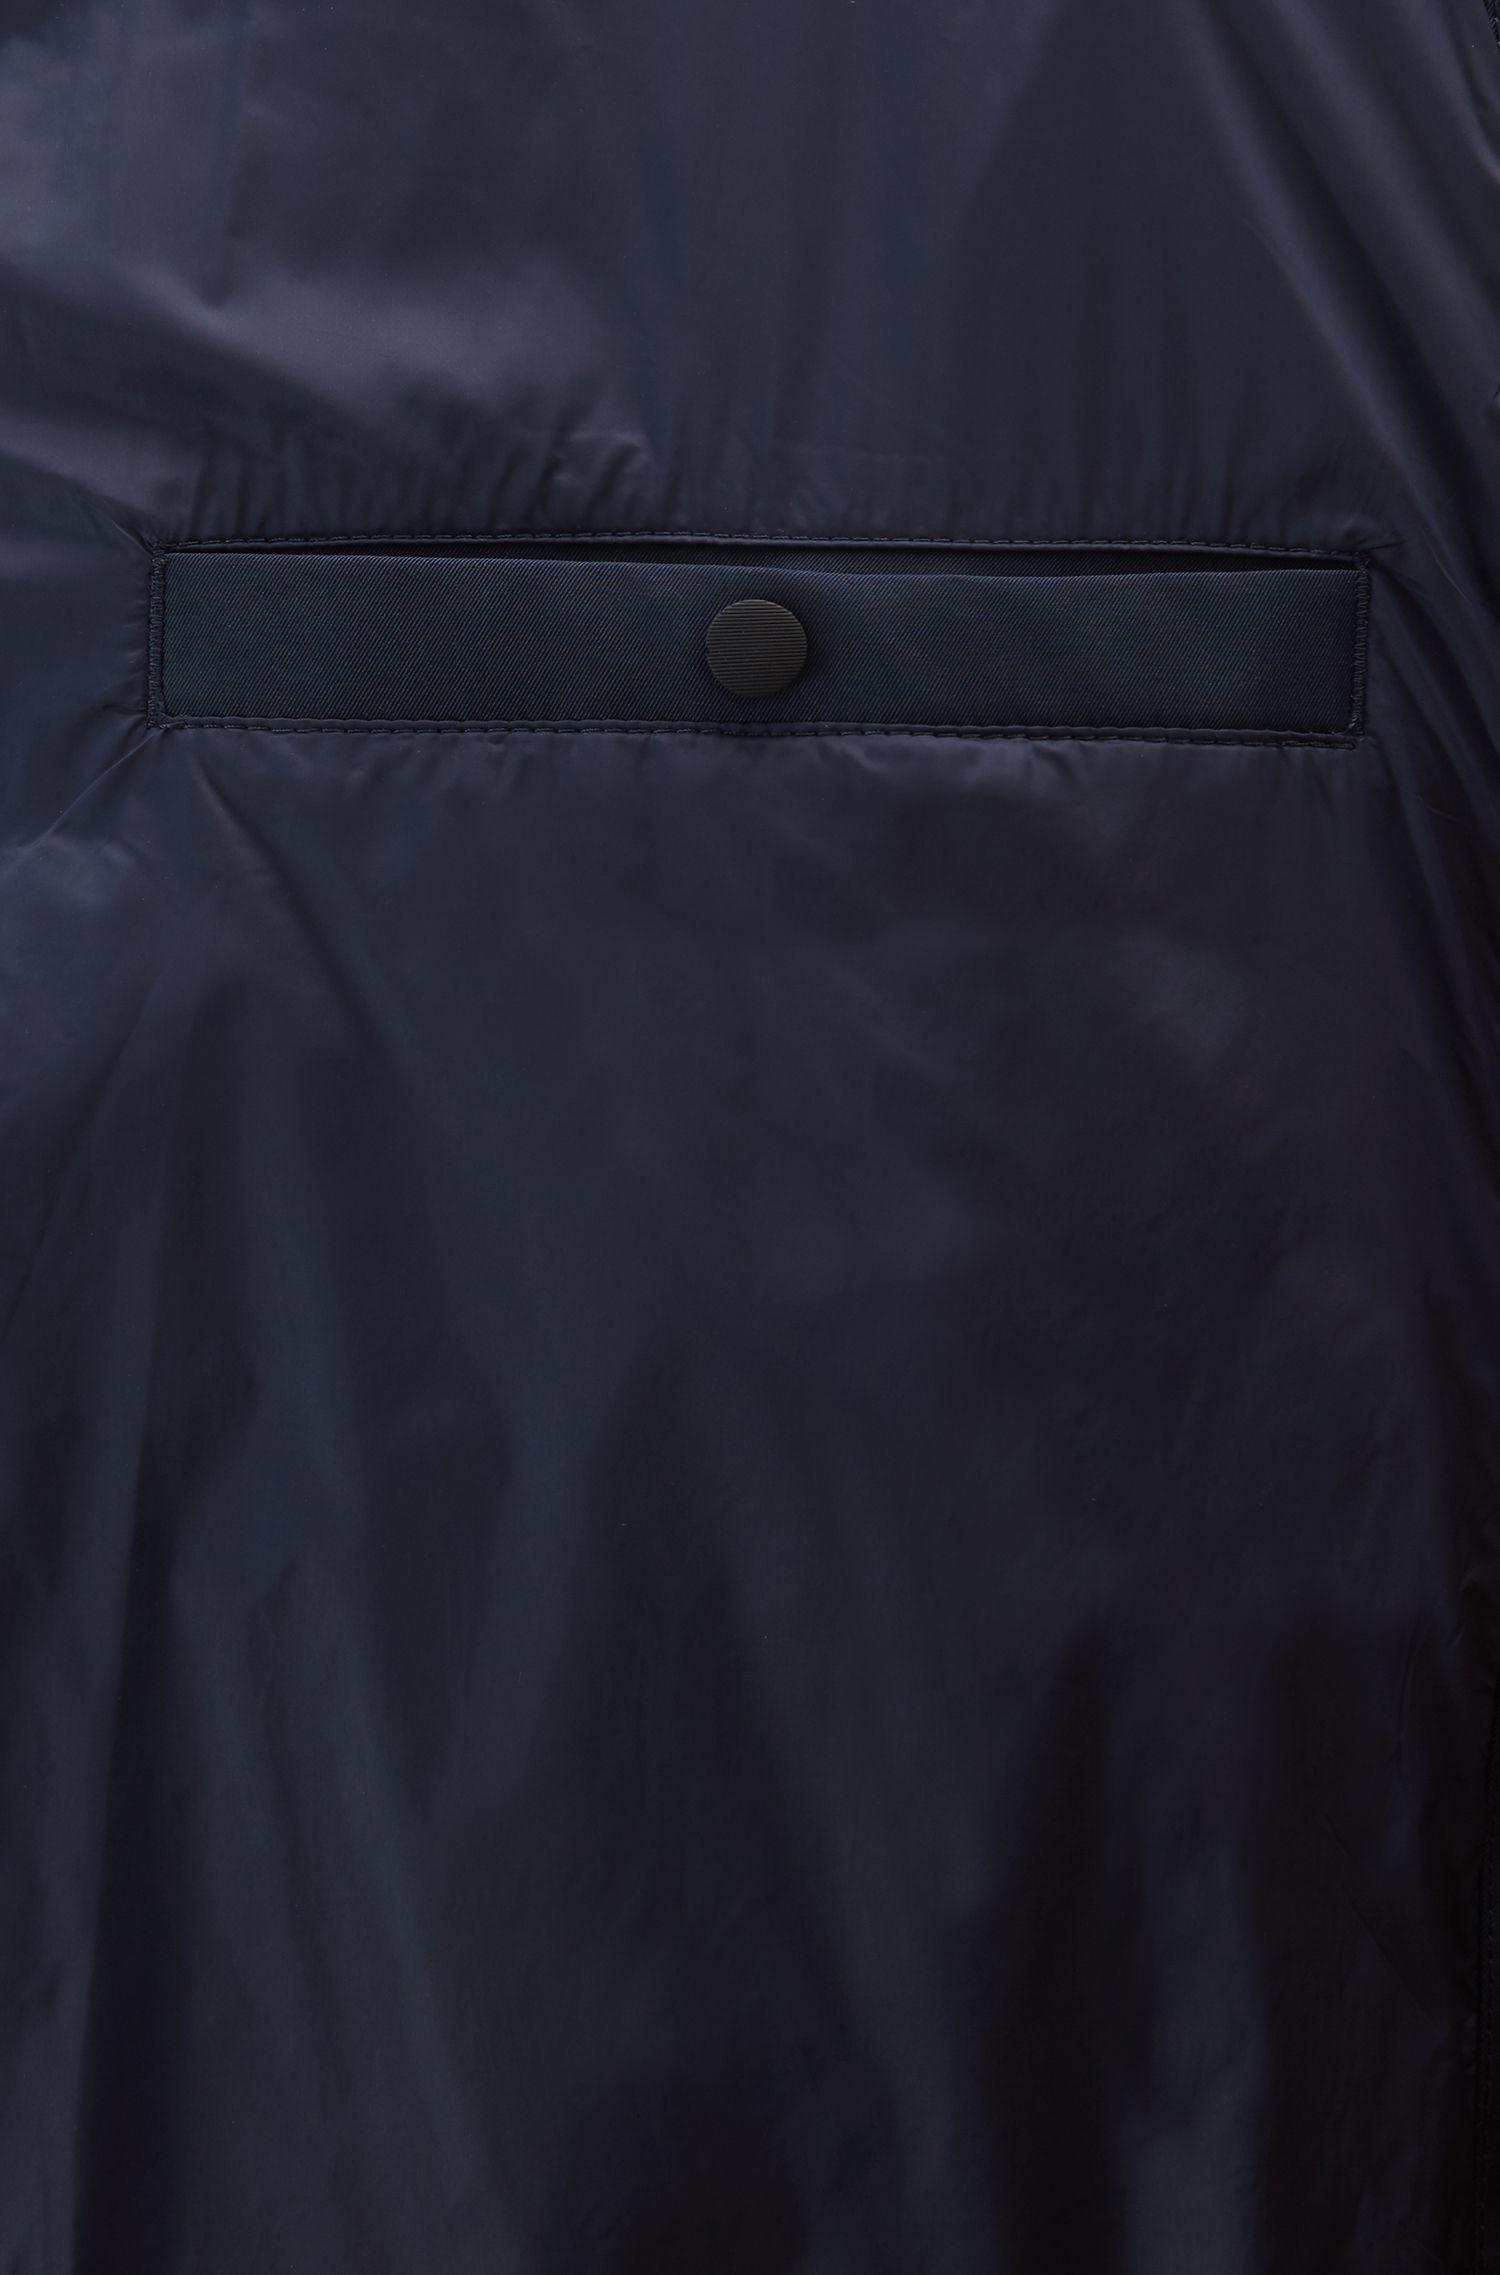 Waterafstotende donsparka met binnenkant in colourblock, Zwart